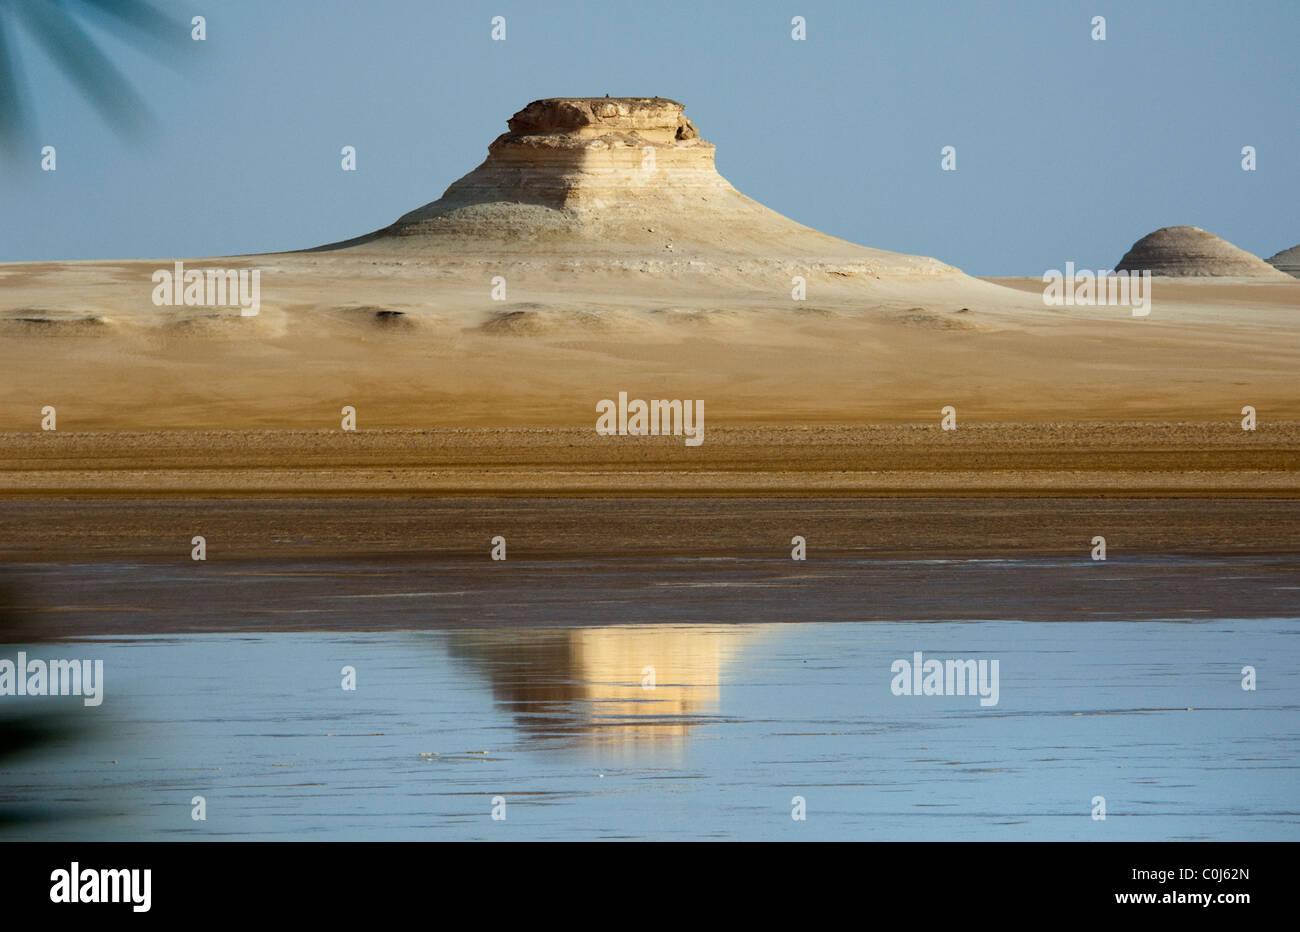 Lake Bahrain, Egypt - Stock Image